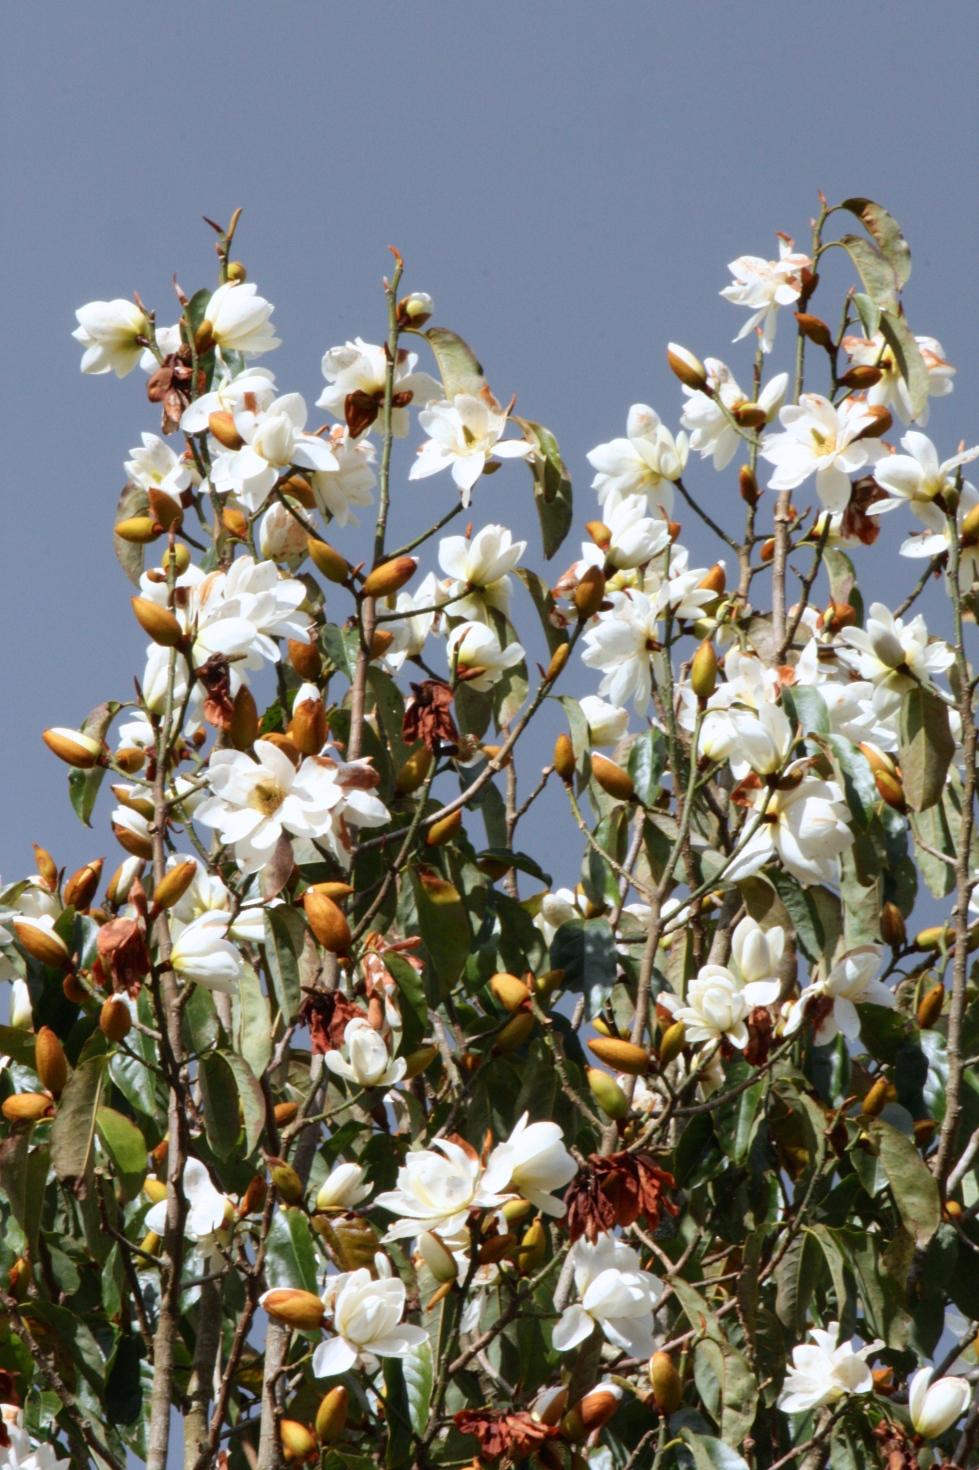 Magnolia (Michelia) doltsopa, Burncoose, Cornwall, March 2016